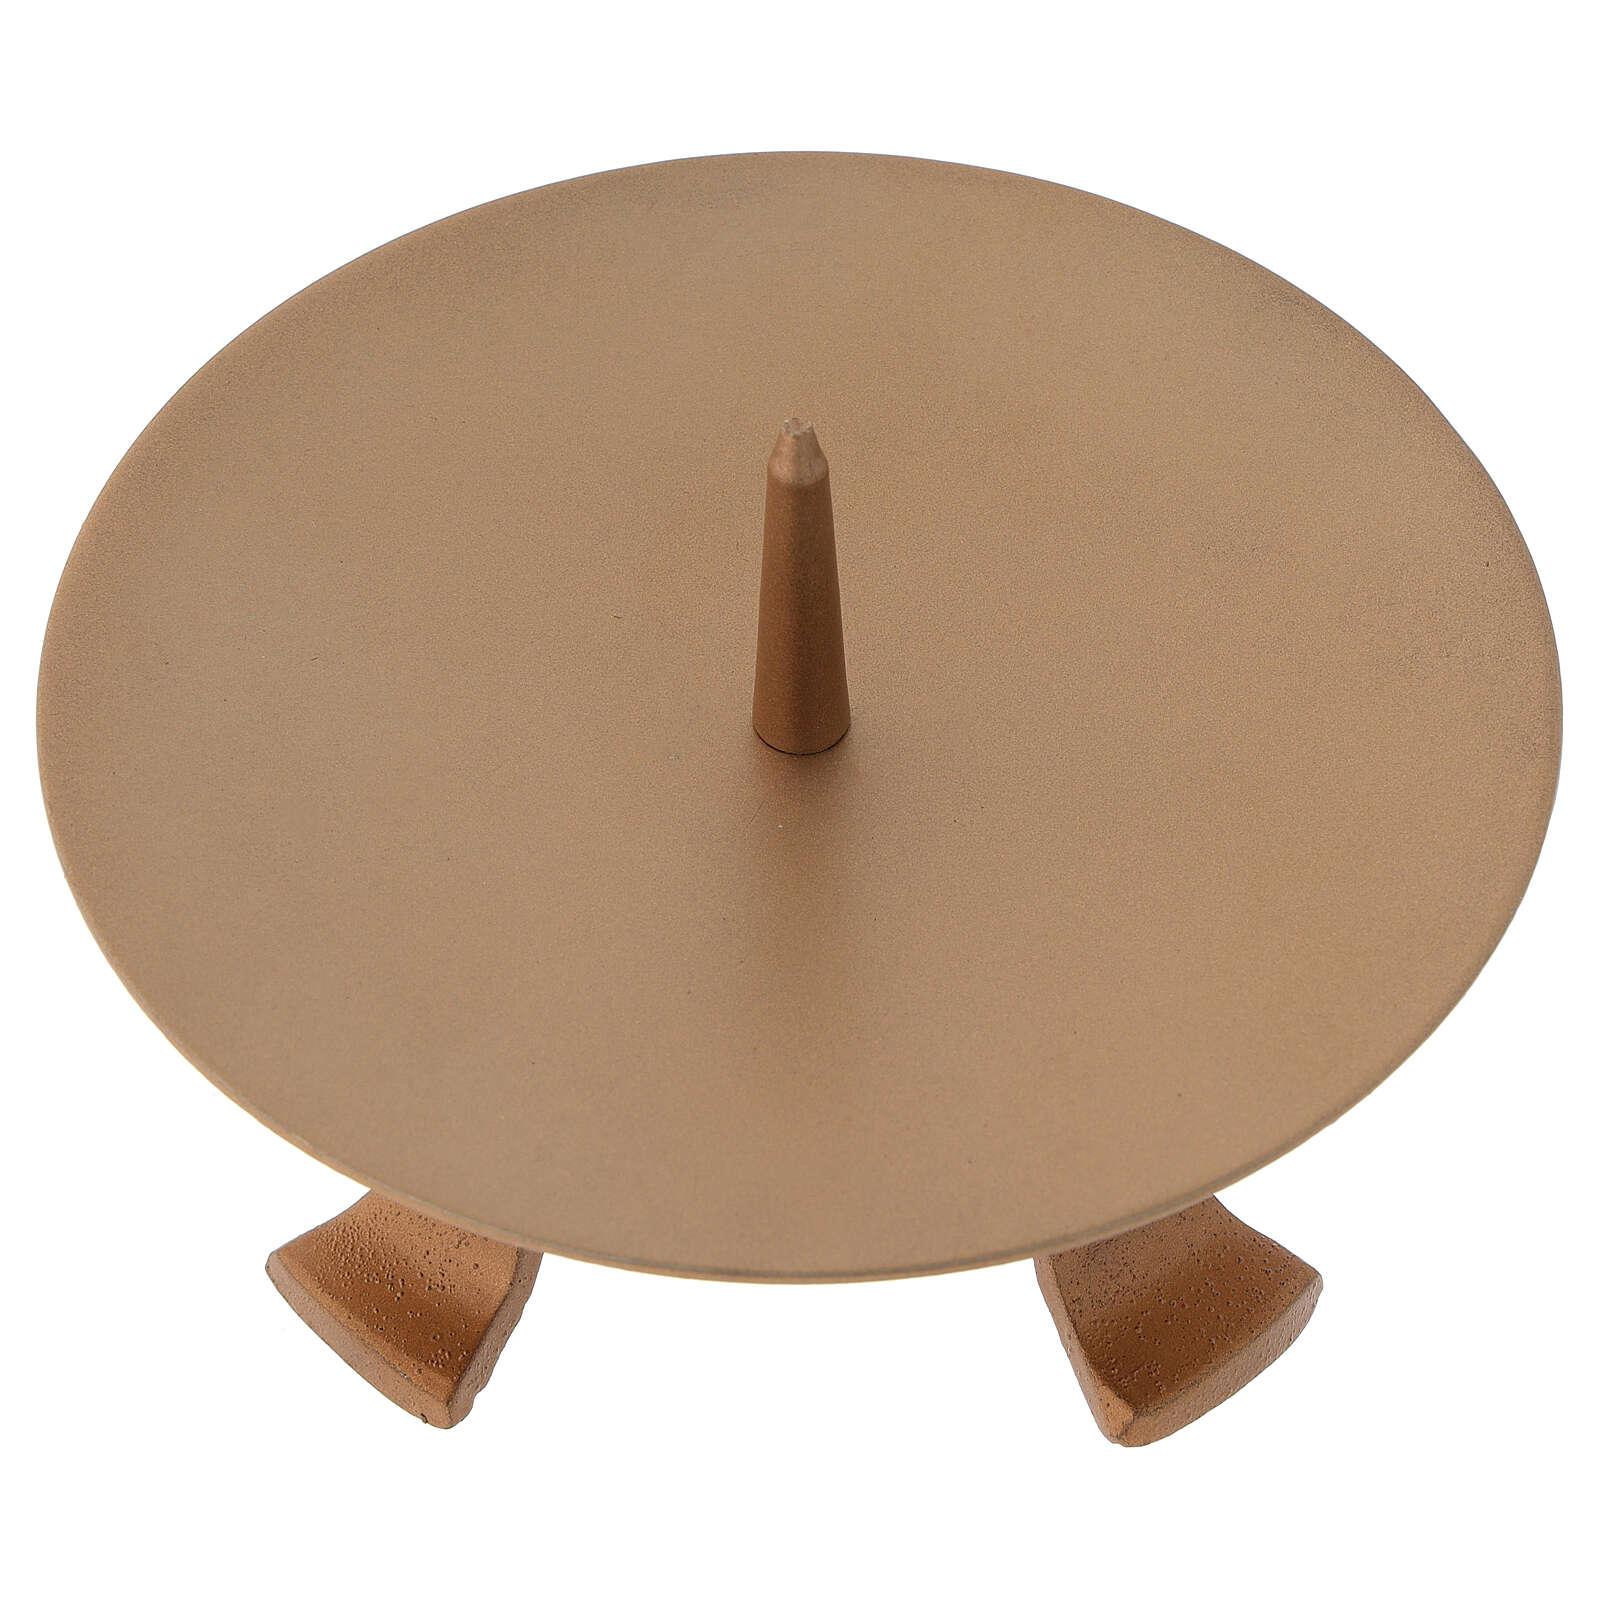 Portacandela piedini ferro dorato punzone diametro 13 cm 4